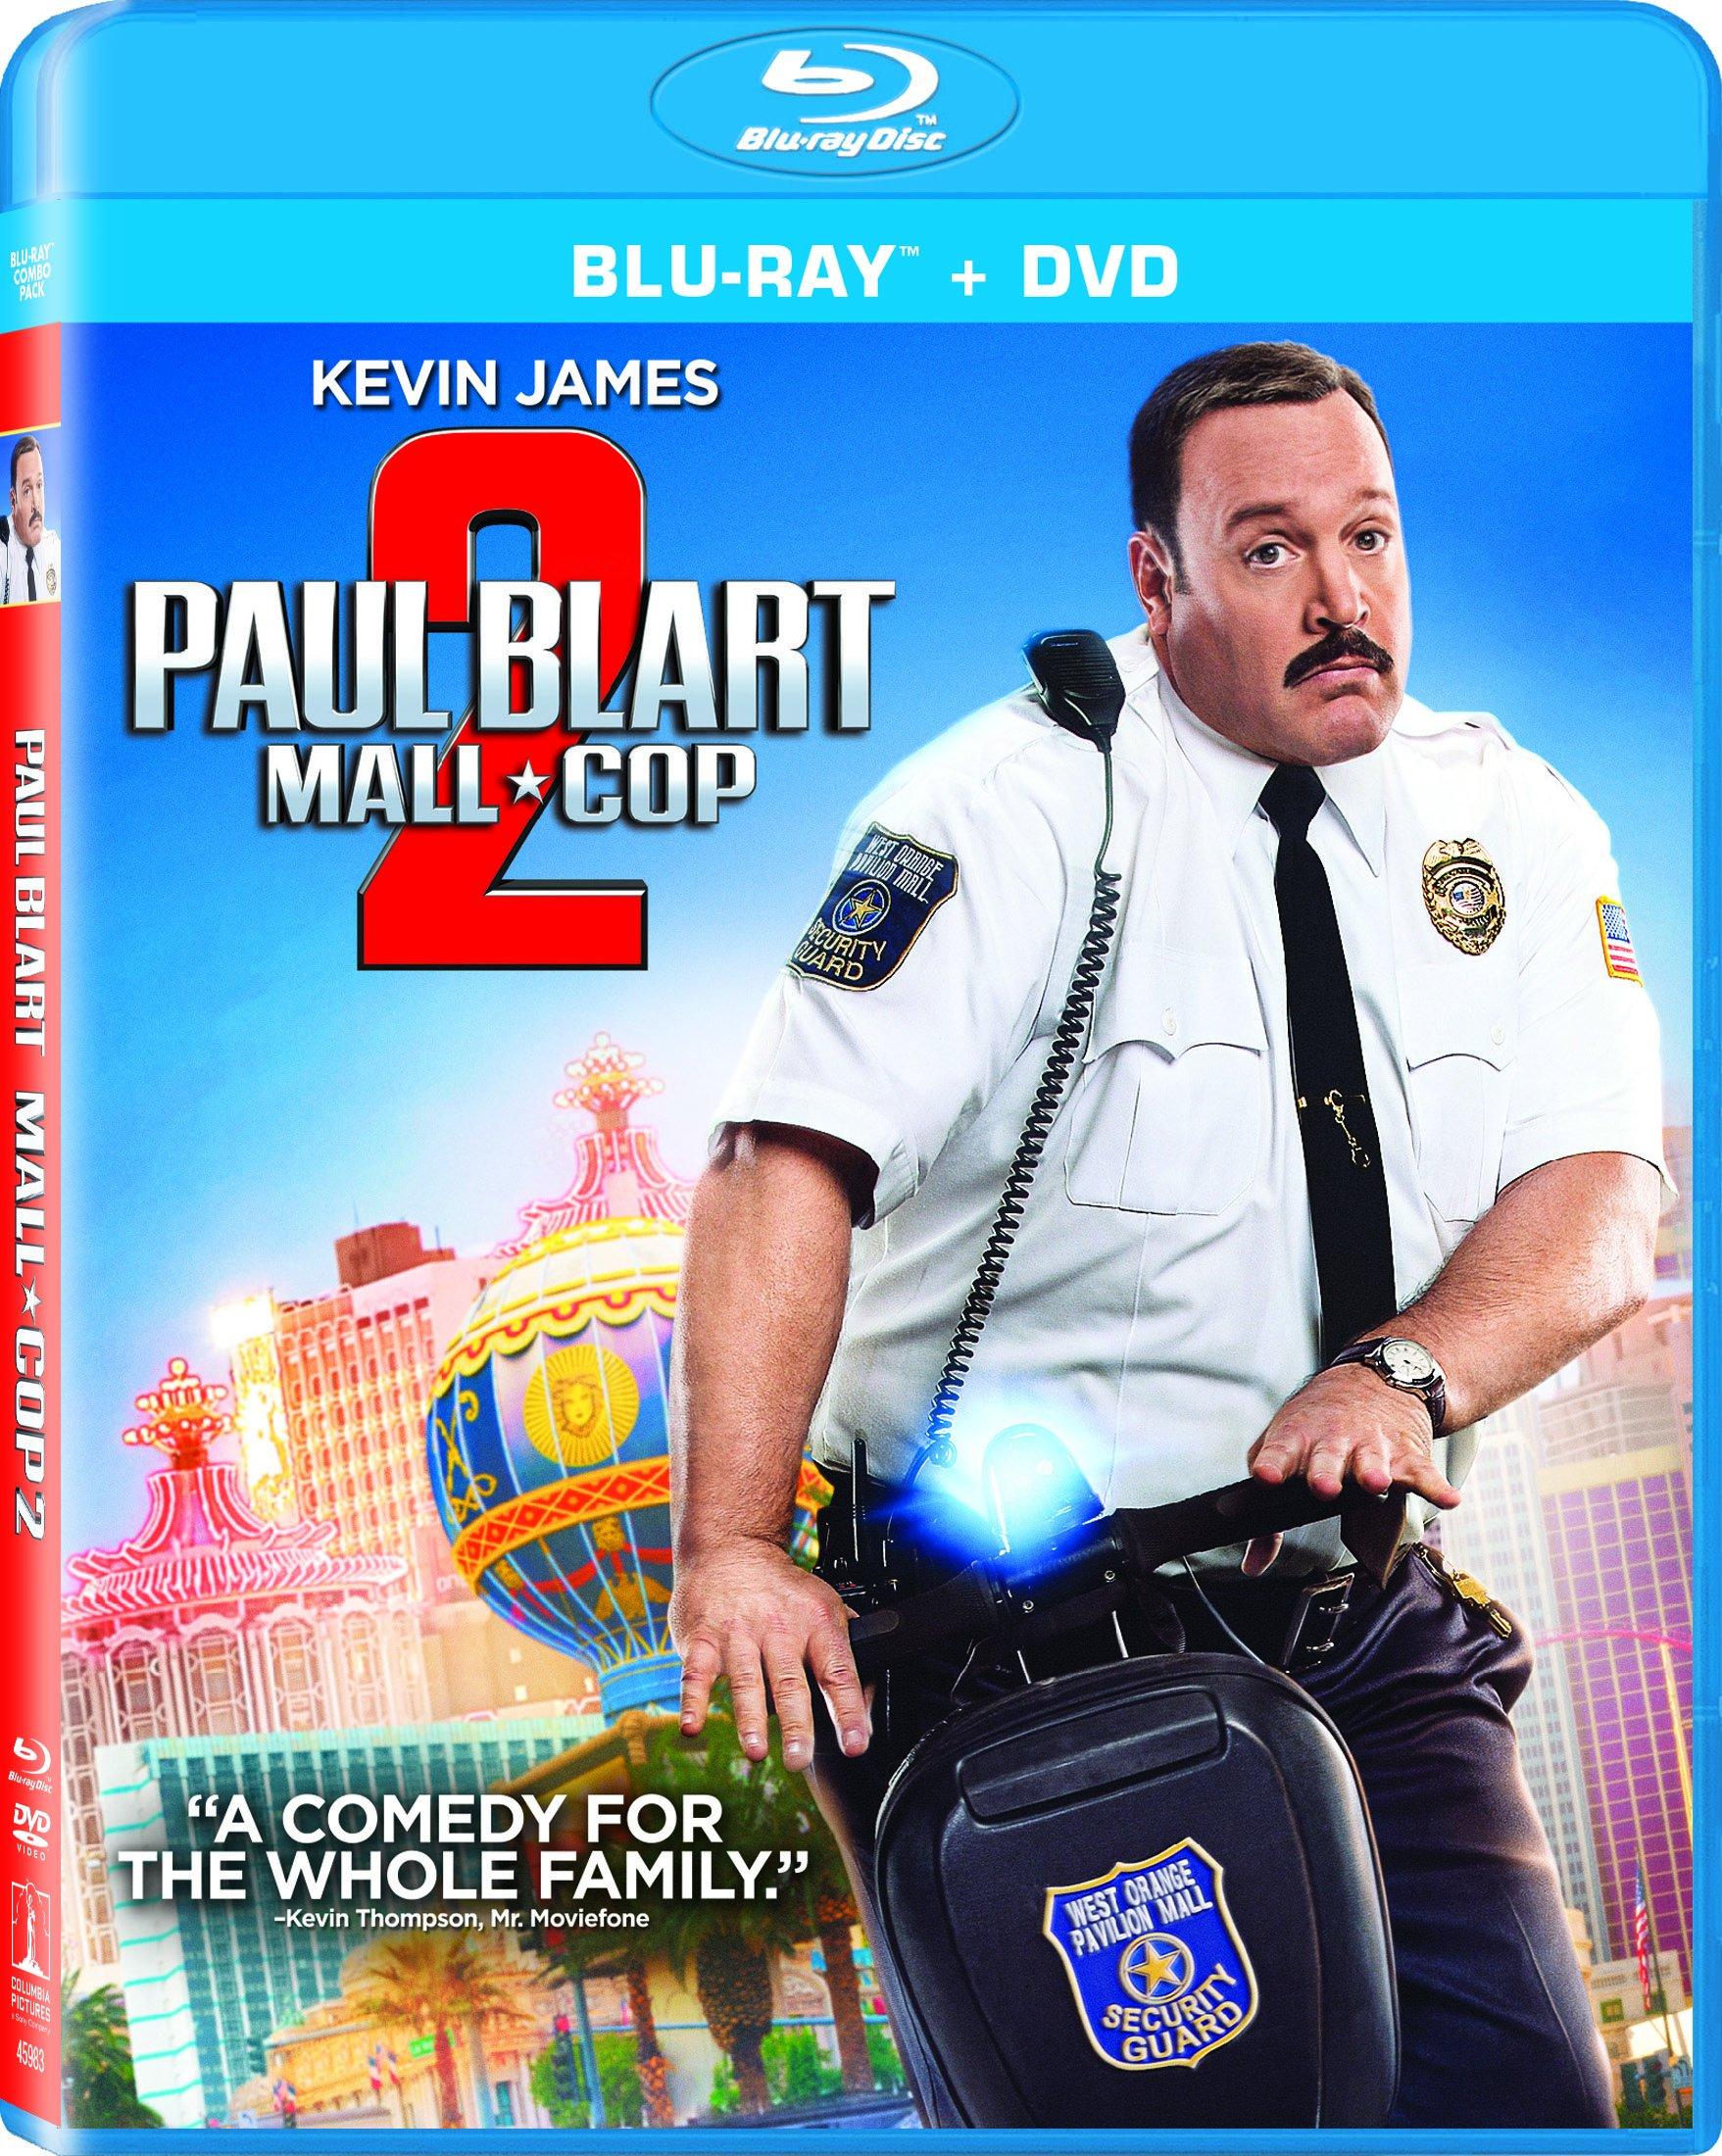 Paul Blart: Mall Cop 2 (Blu-ray + DVD + UltraViolet) | eBay